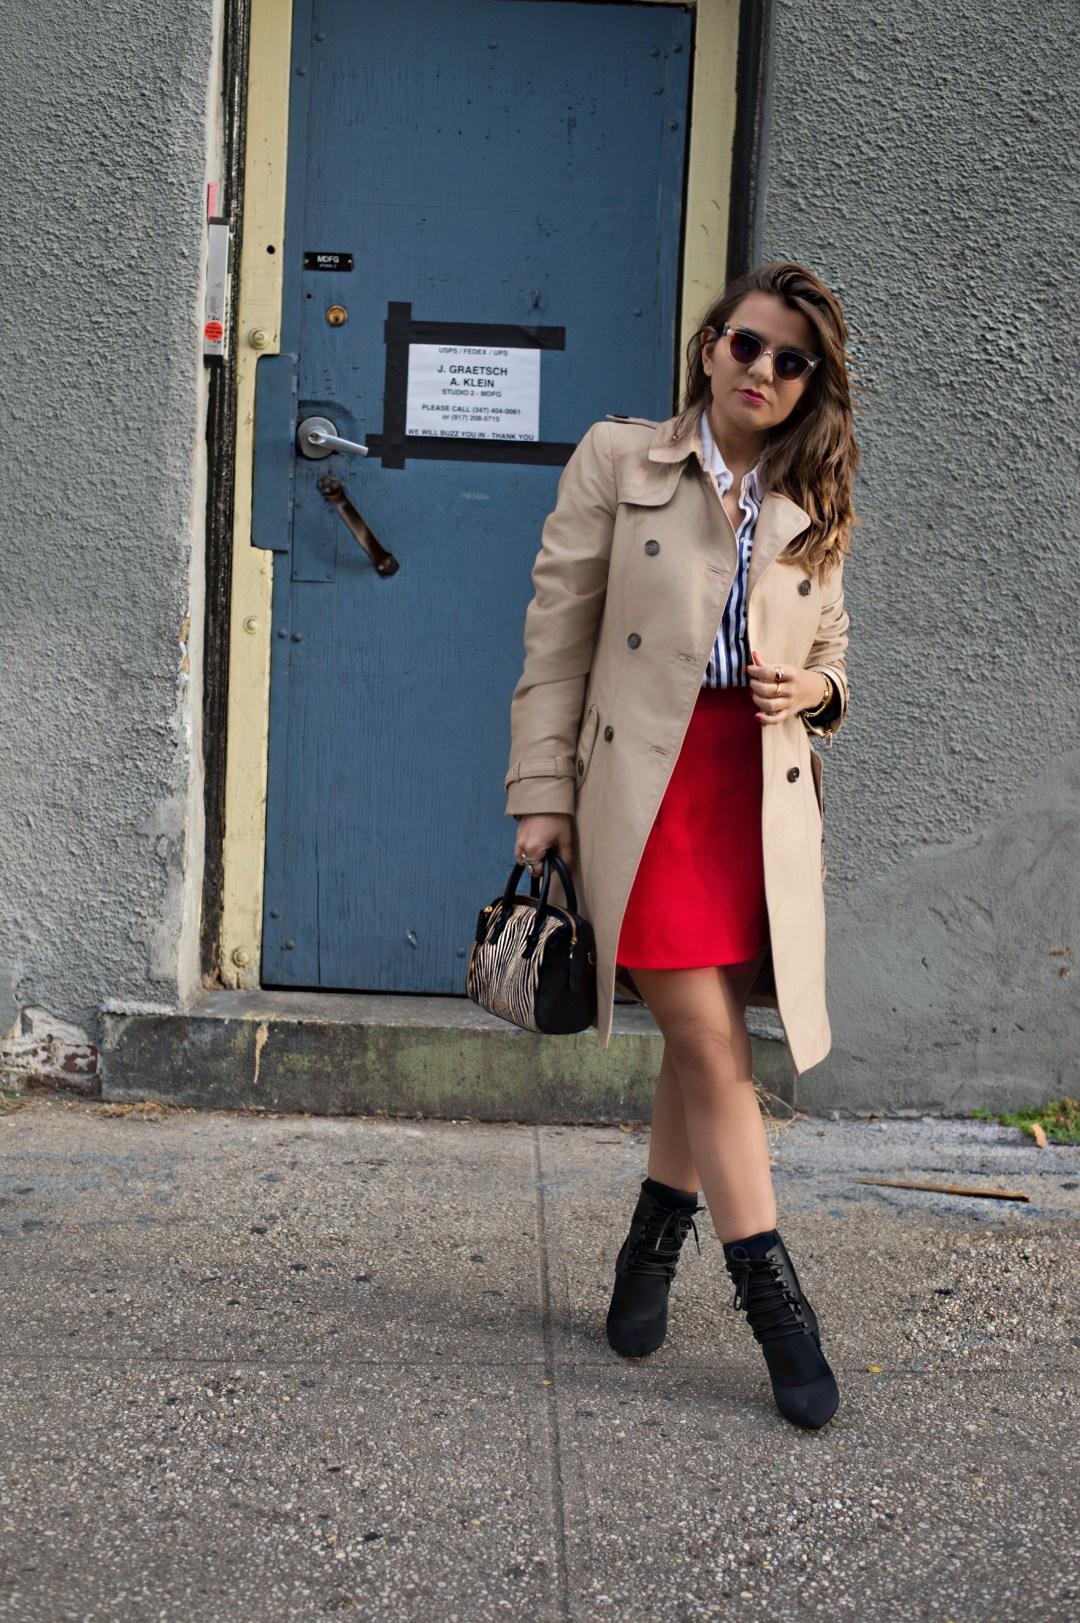 j-crew-a-line-red-skirt-socks-booties-trech-coat-stripe-shirts-street-style-alley-girl-3